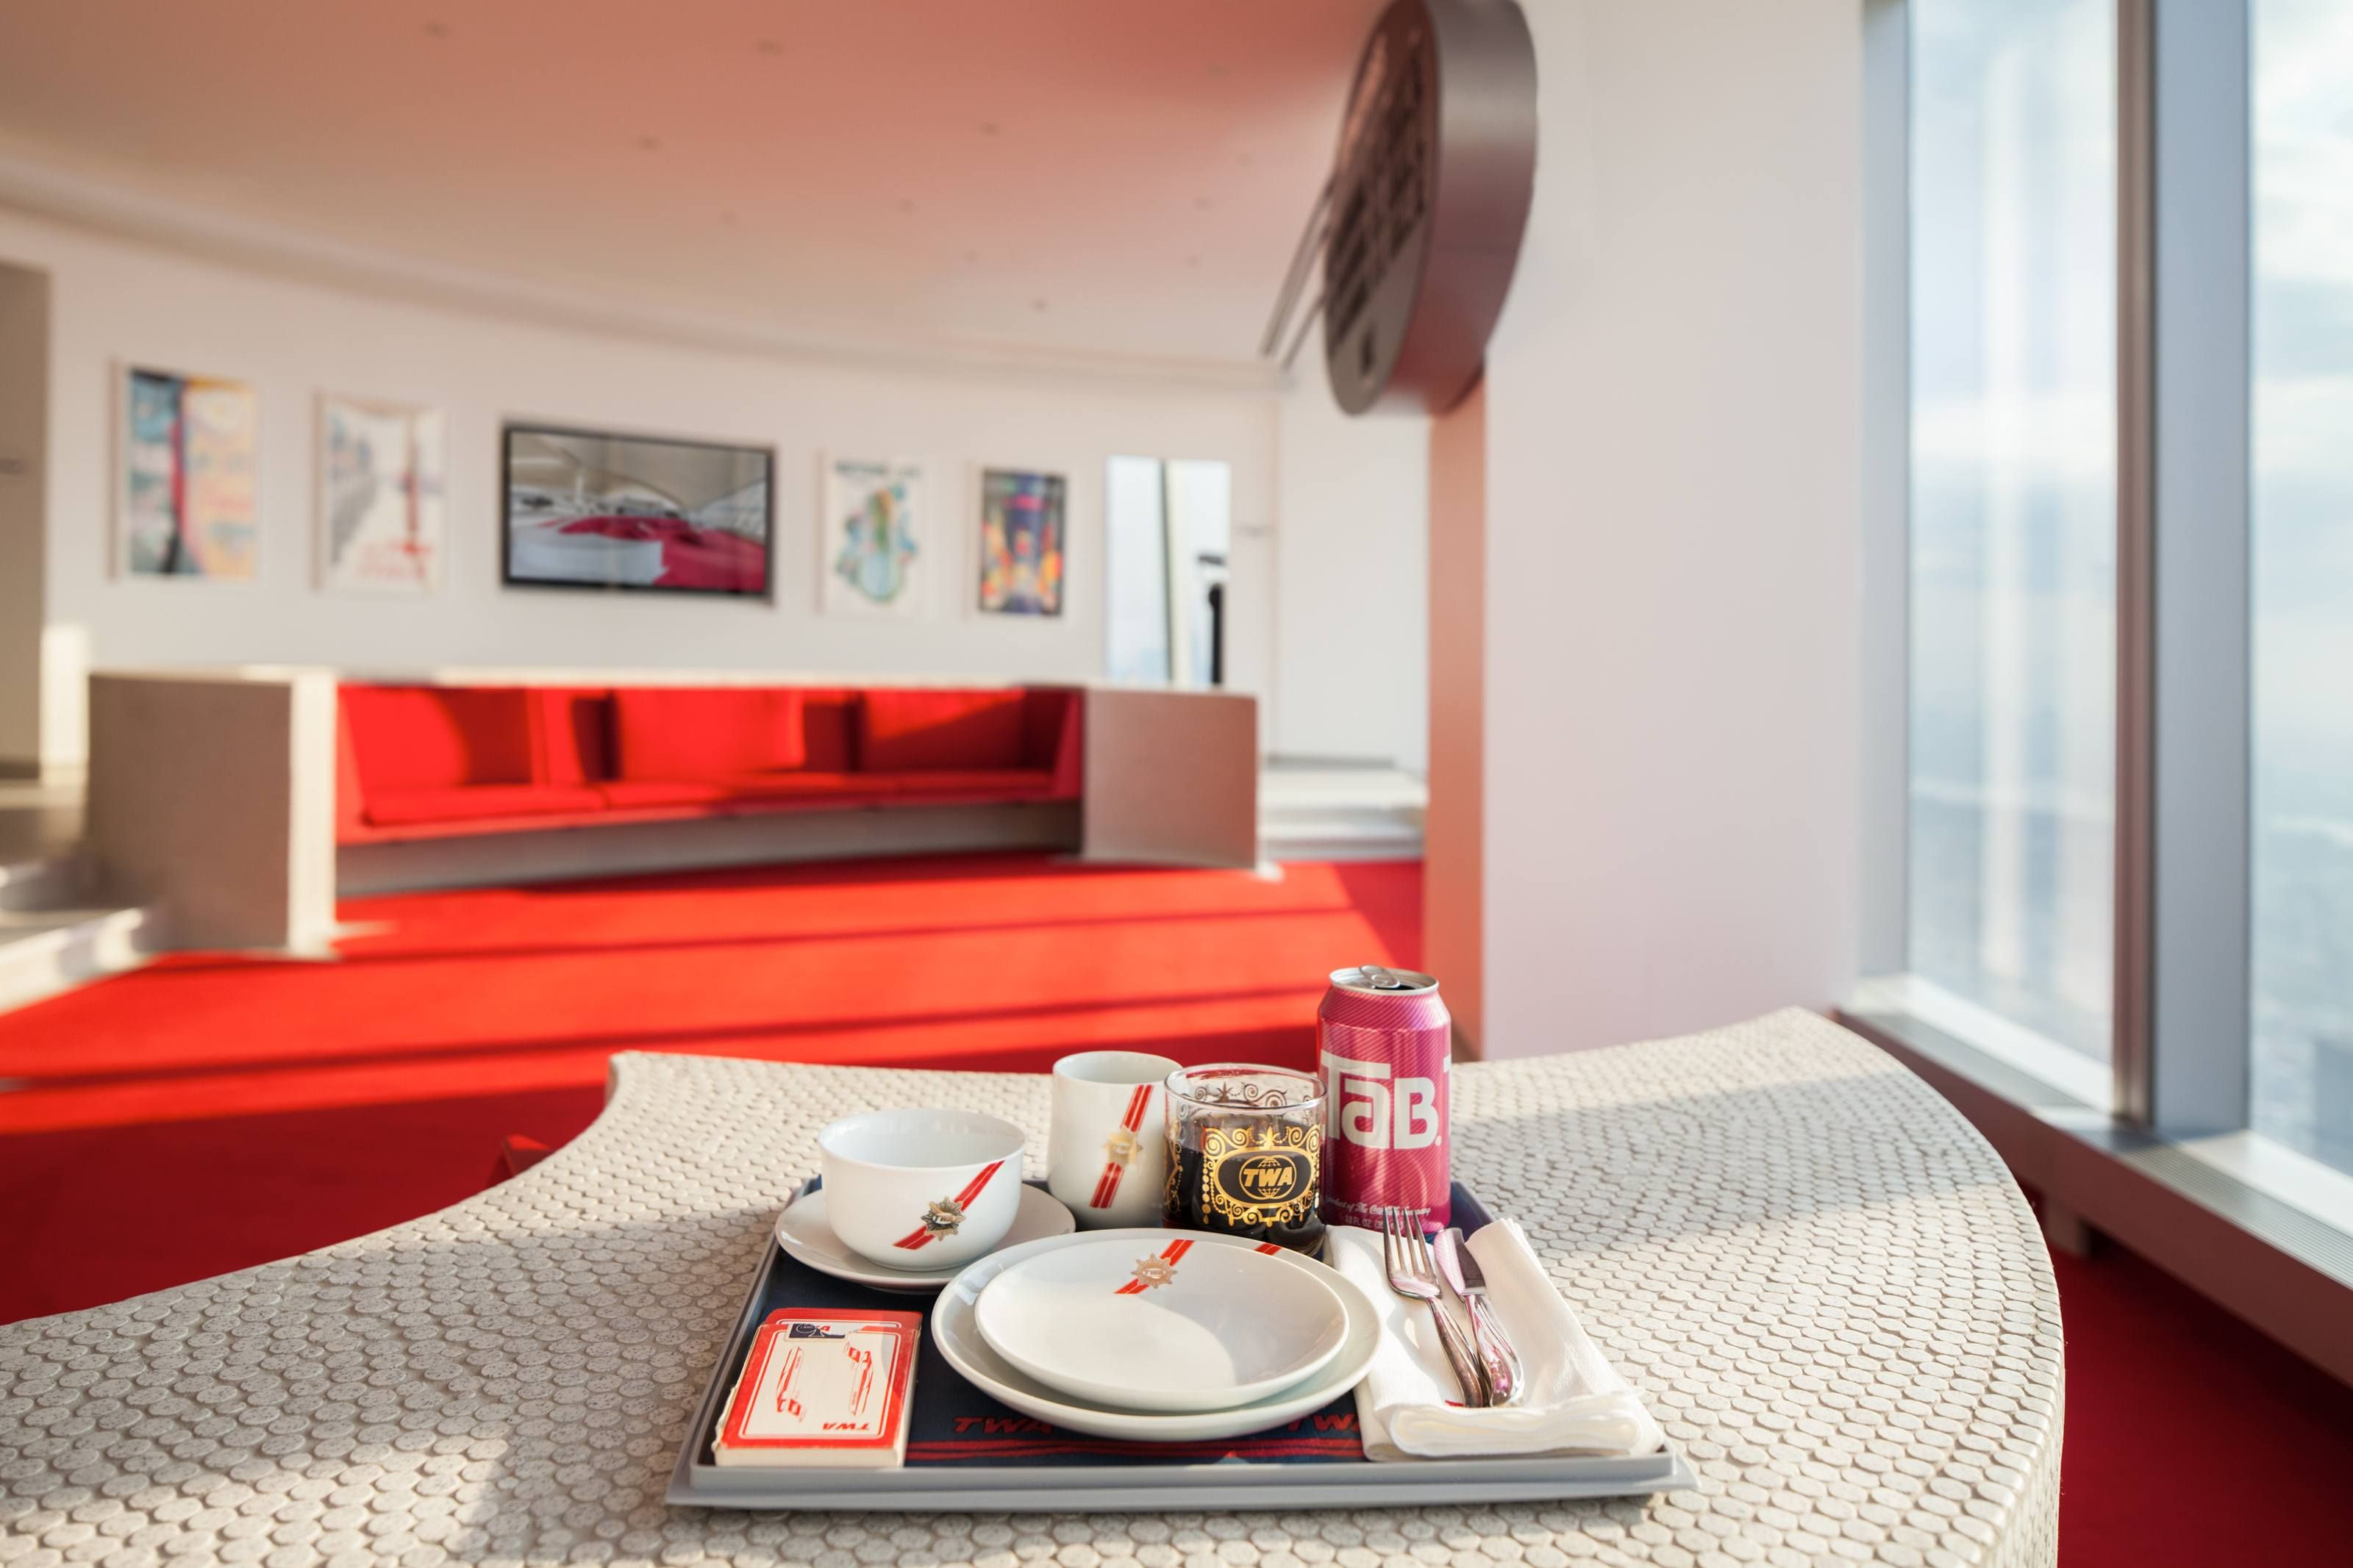 Lubrano Ciavarra Architects Jet Age Architecture Twa One World Trade Center Eero Saarinen Lounge Hotel Mcr Development